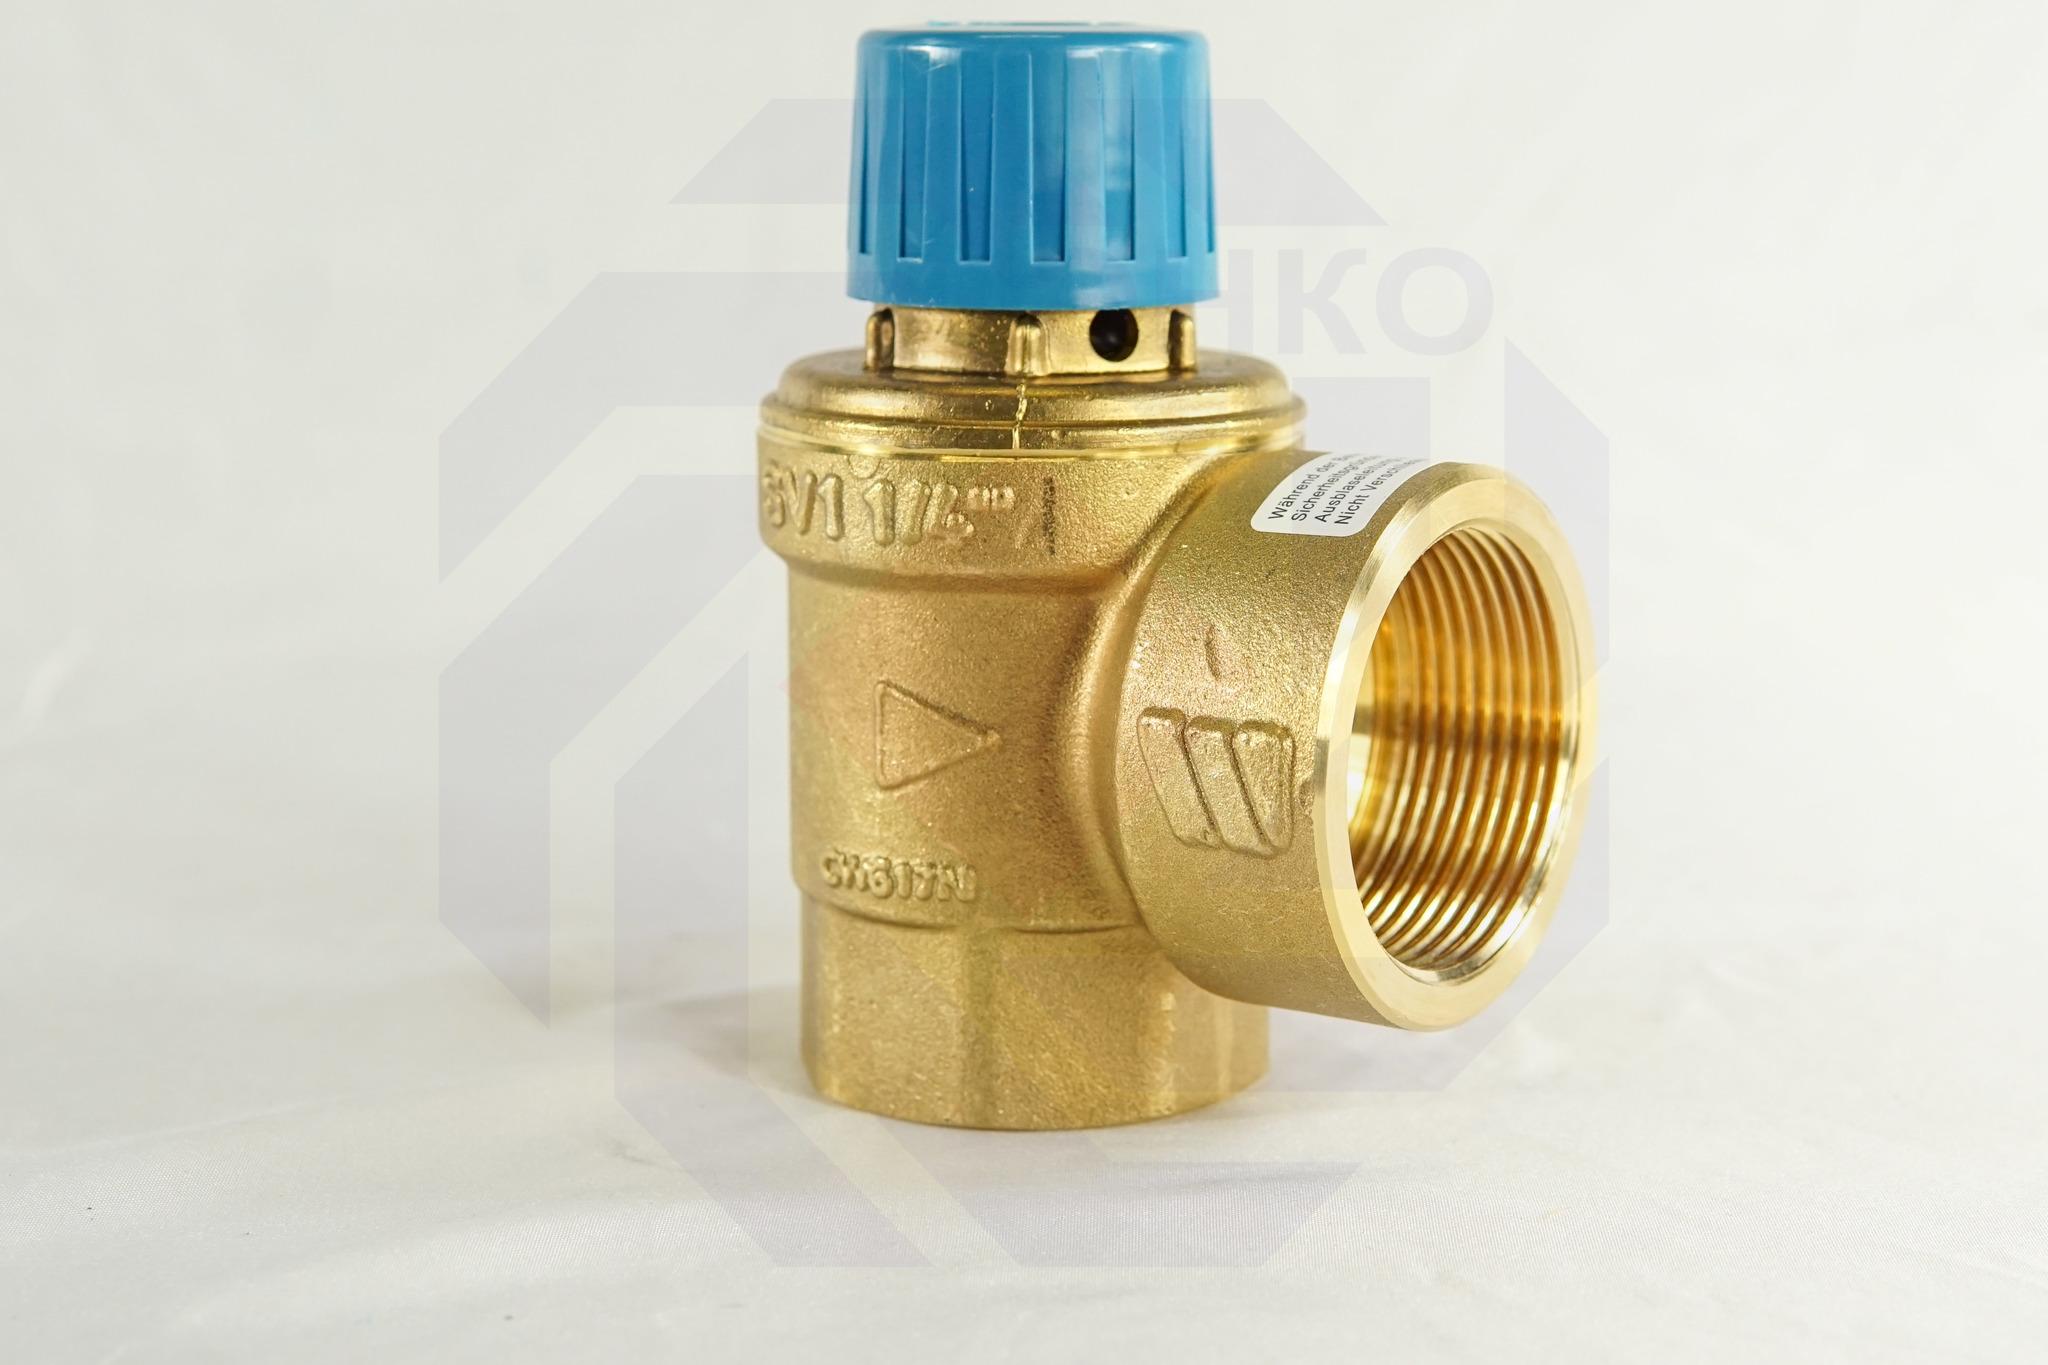 Клапан предохранительный WATTS SVW 6 бар 1¼